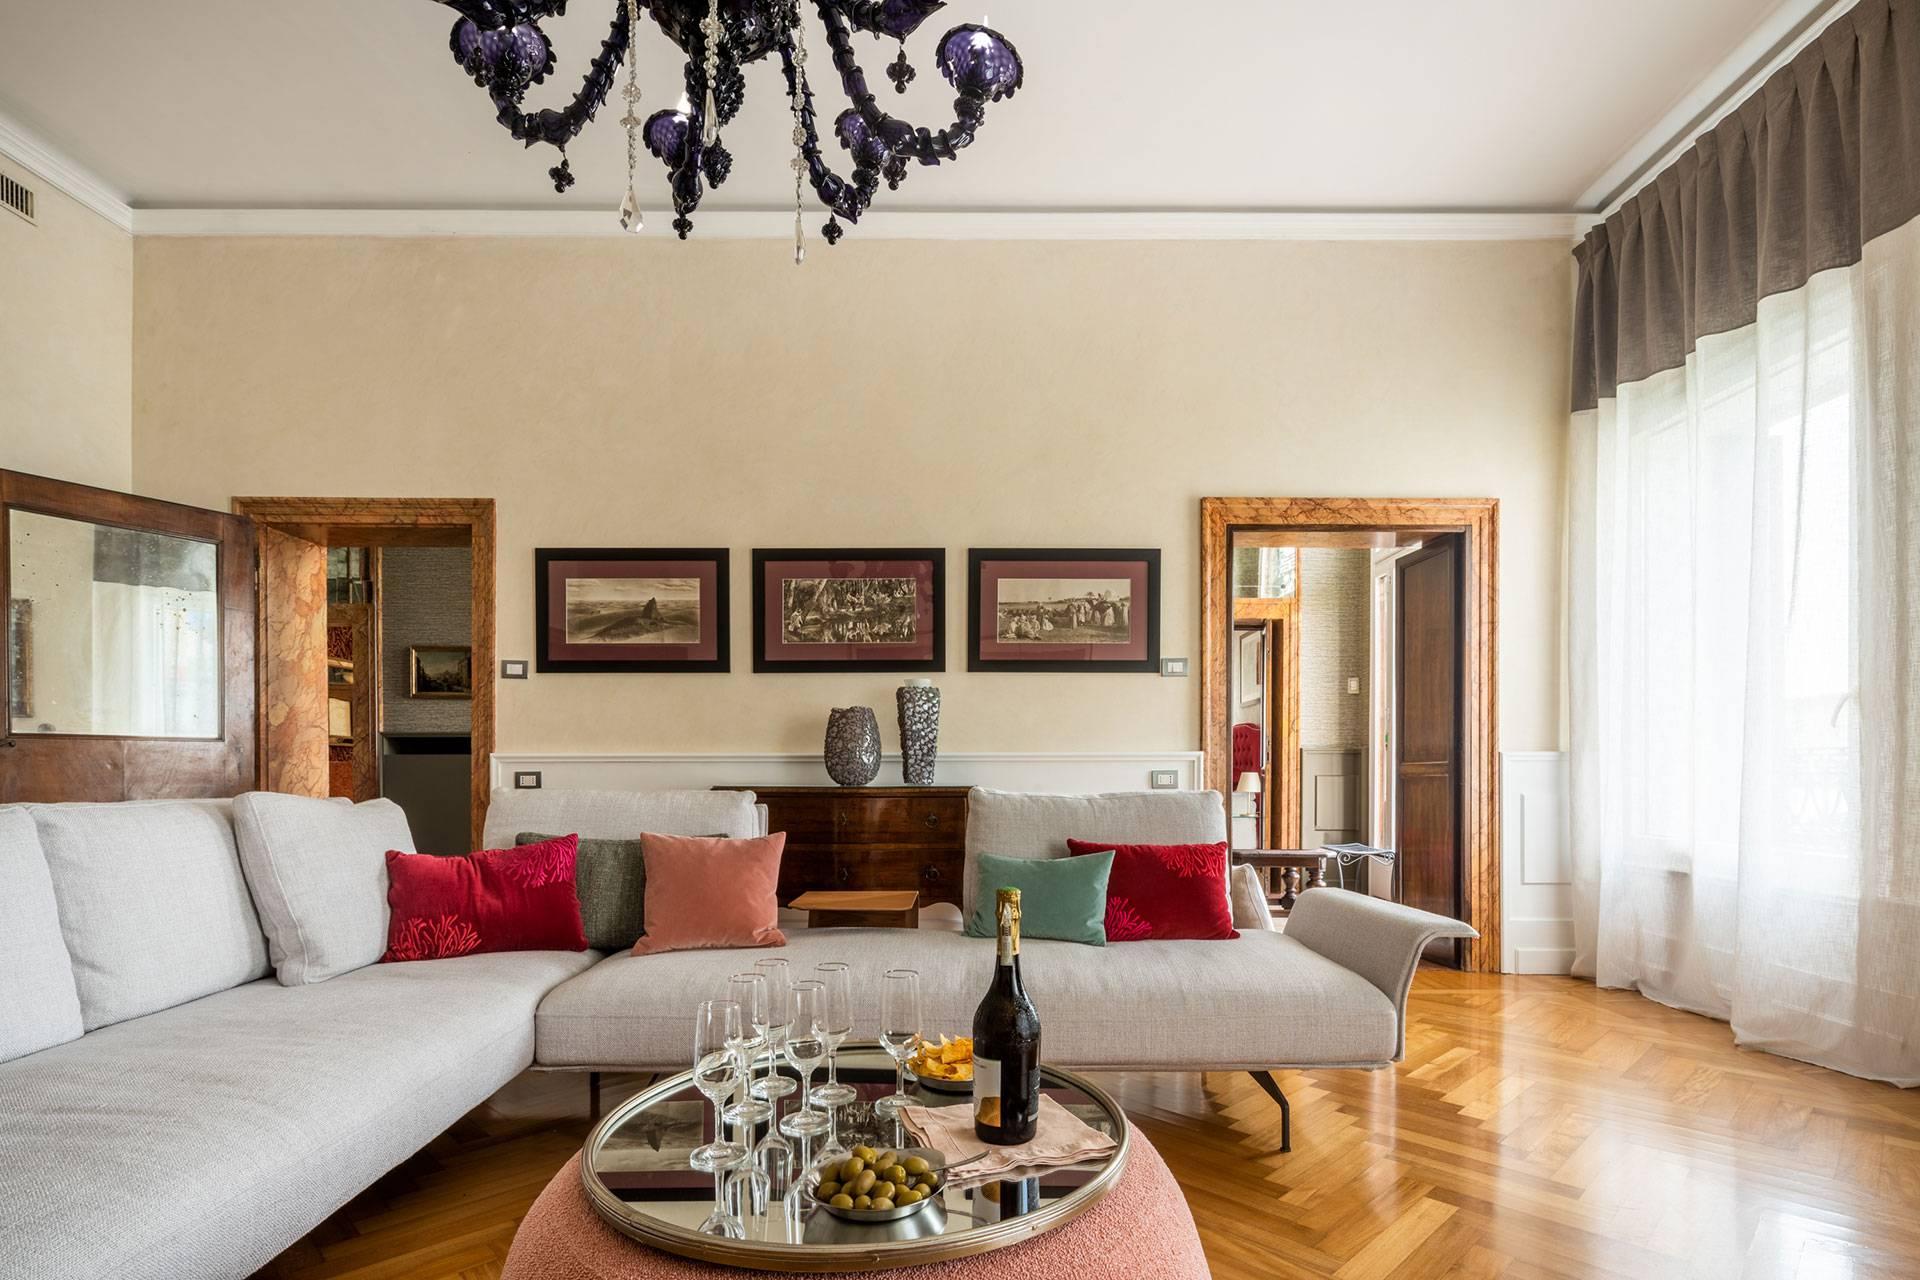 Elegant and spacious living room of the Dogaressa apartment